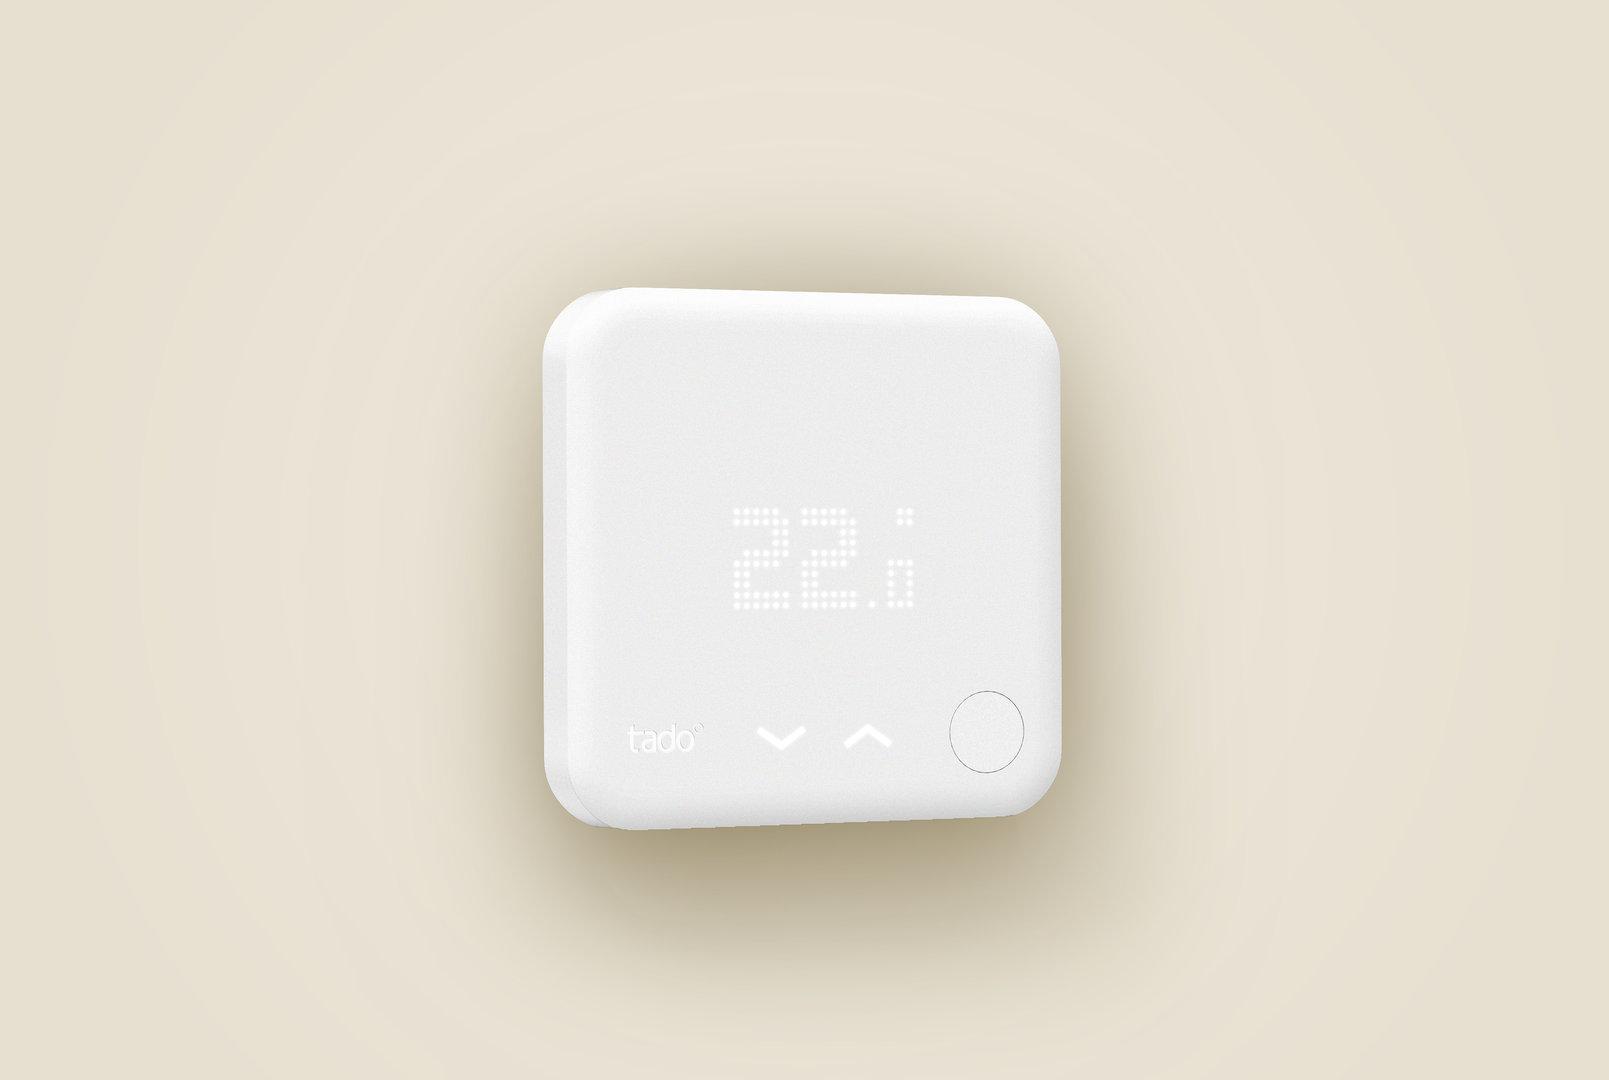 tado° – Smartes Thermostat